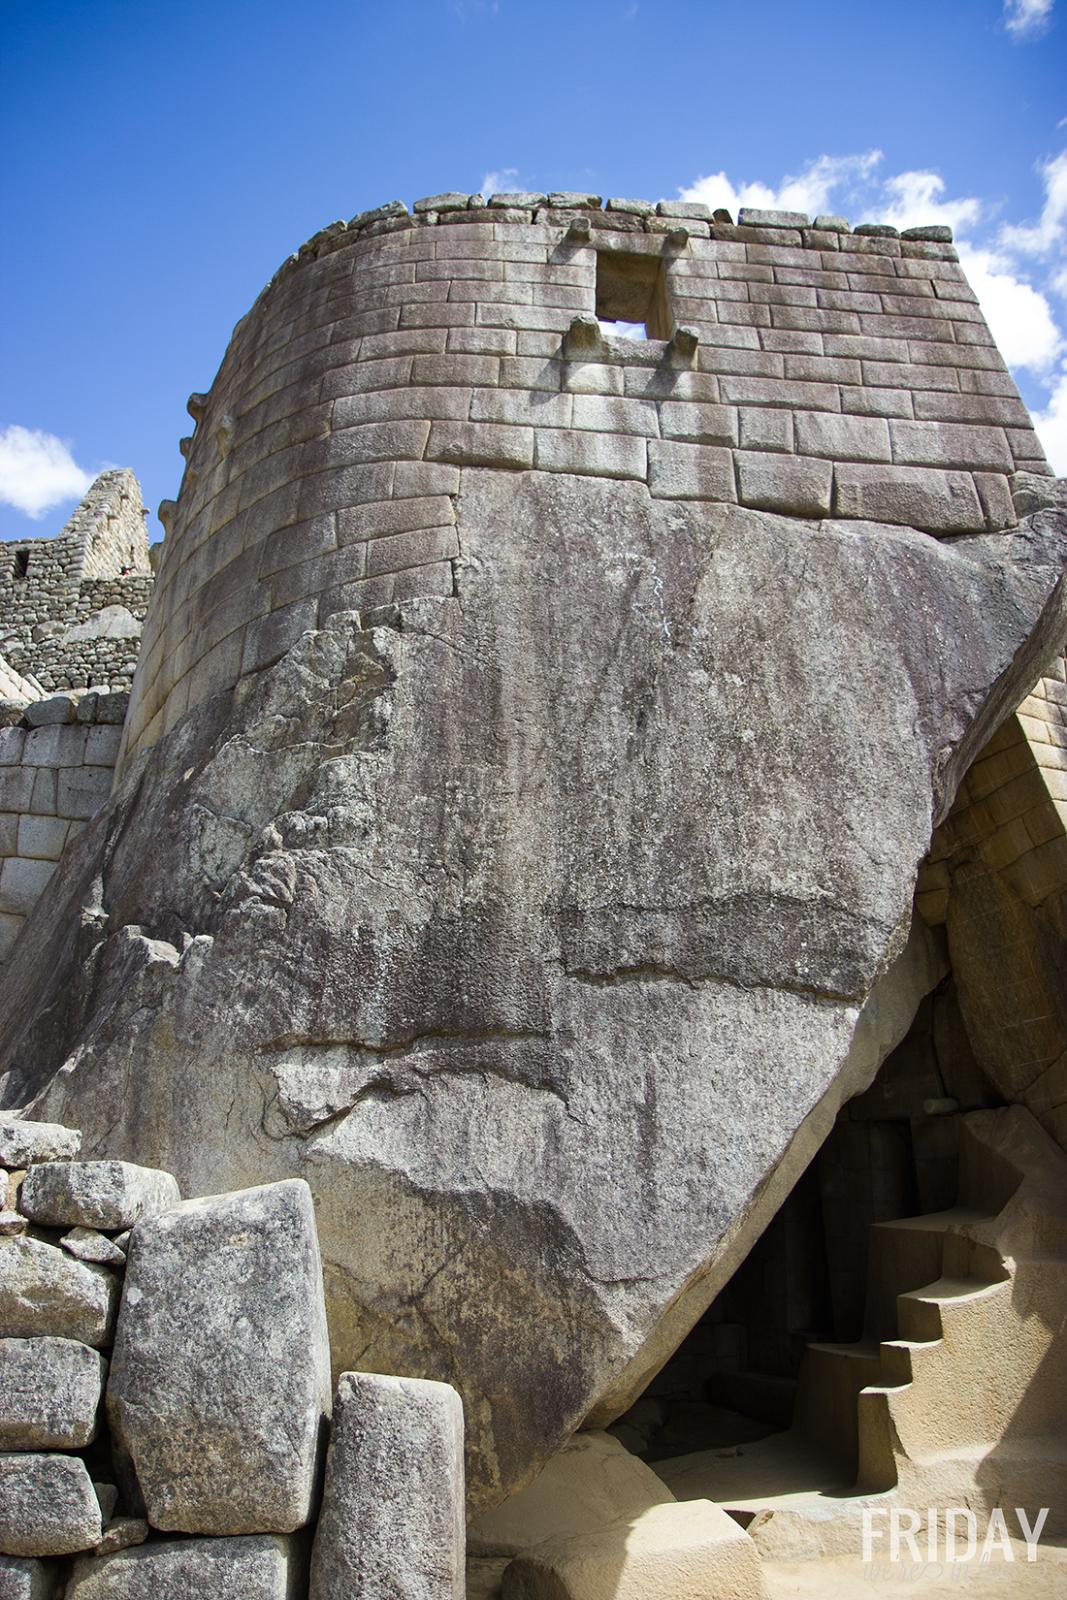 Machu Picchu- Incan Engineering